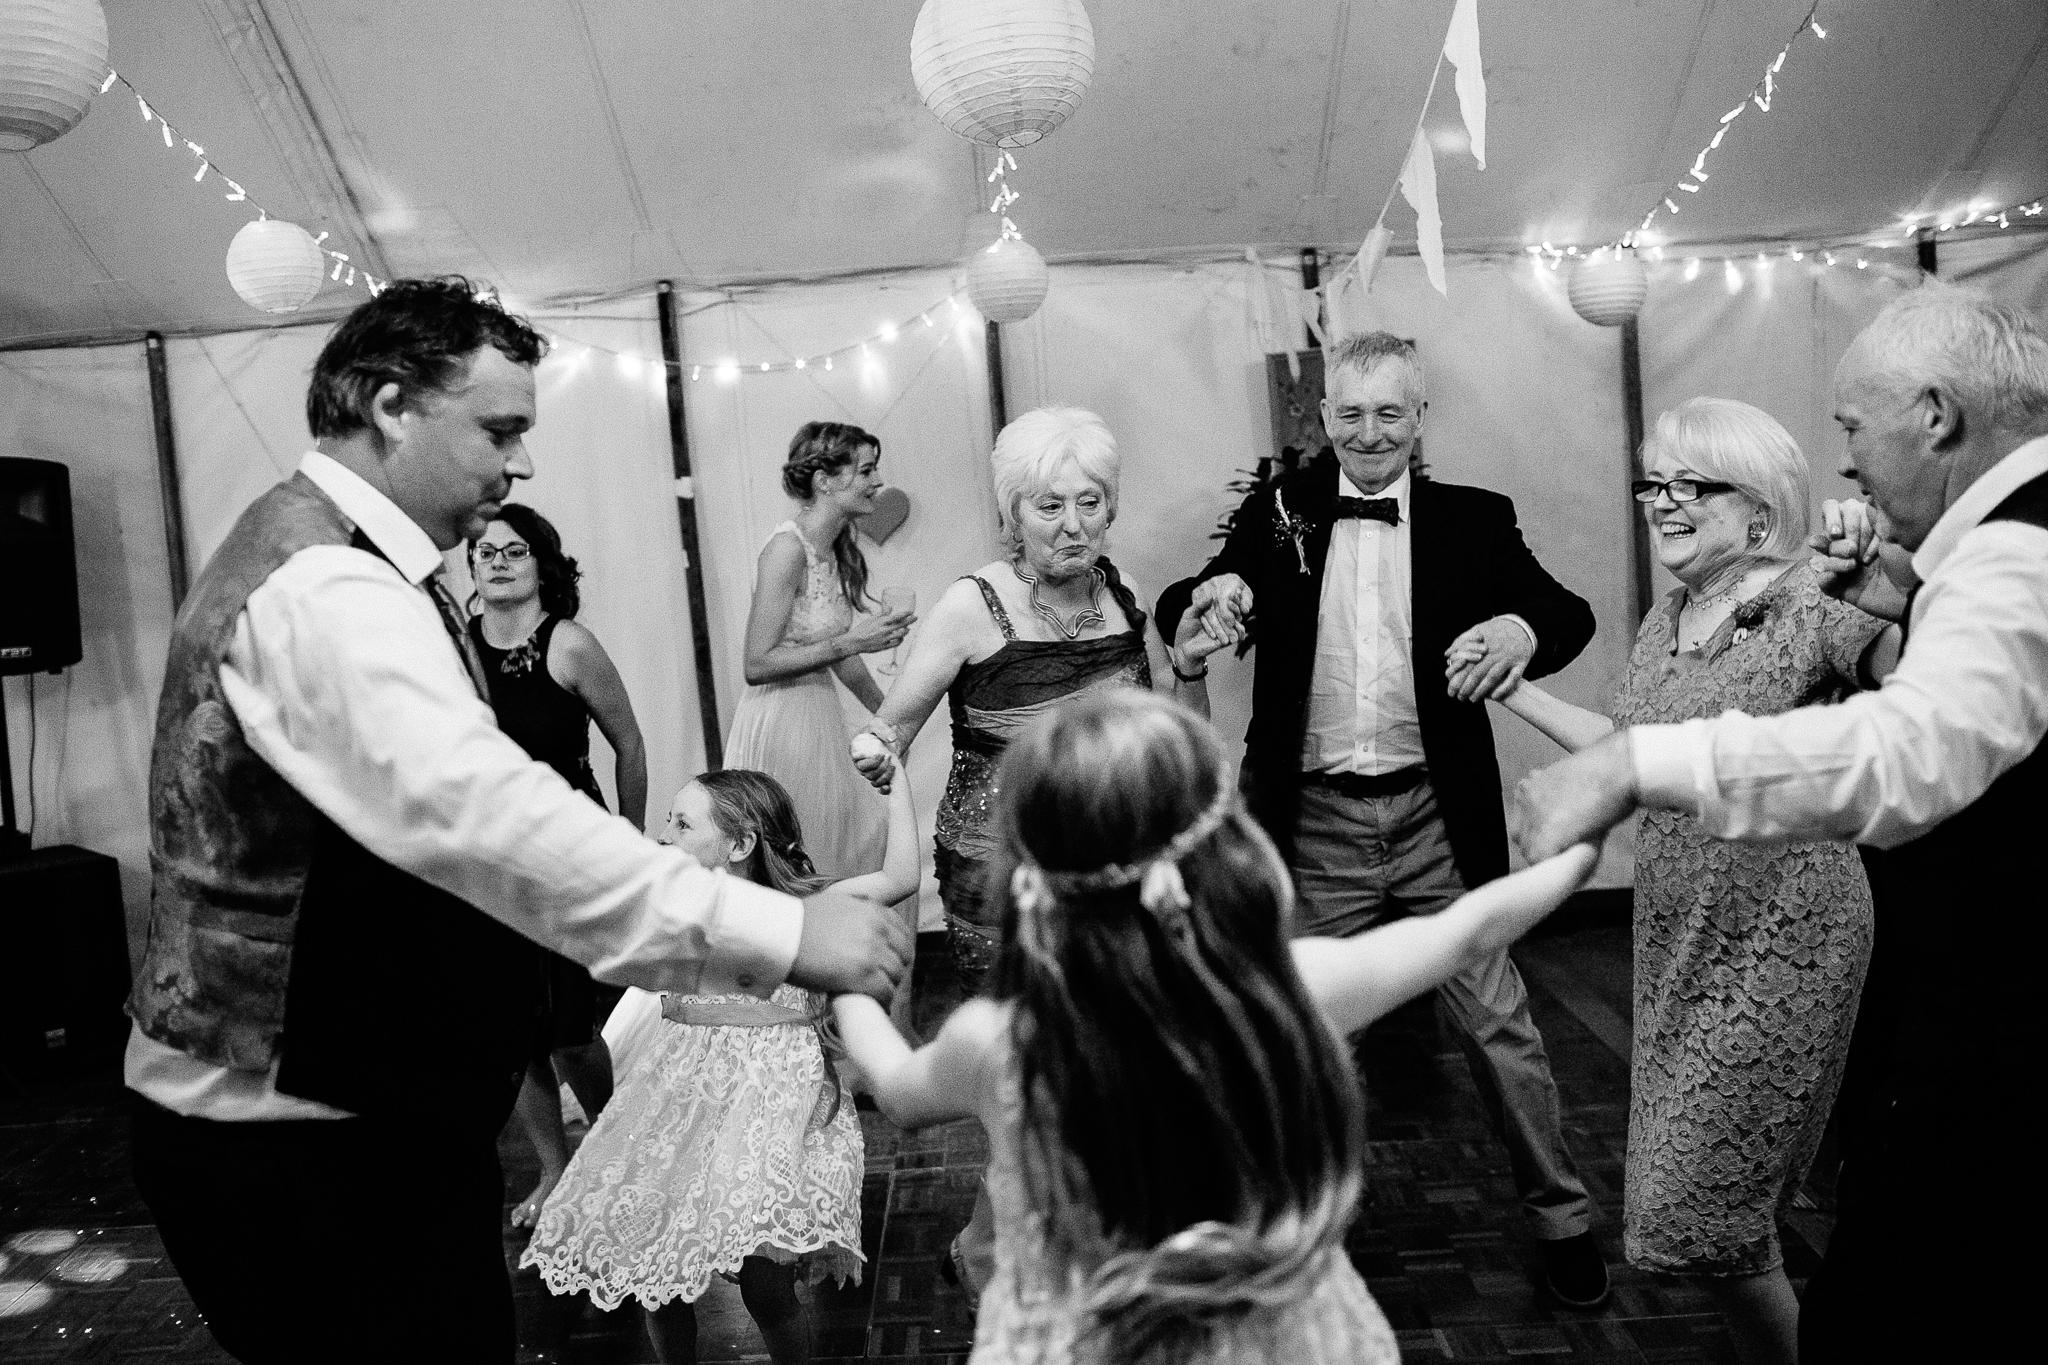 grantham_wedding_photographer-116.jpg